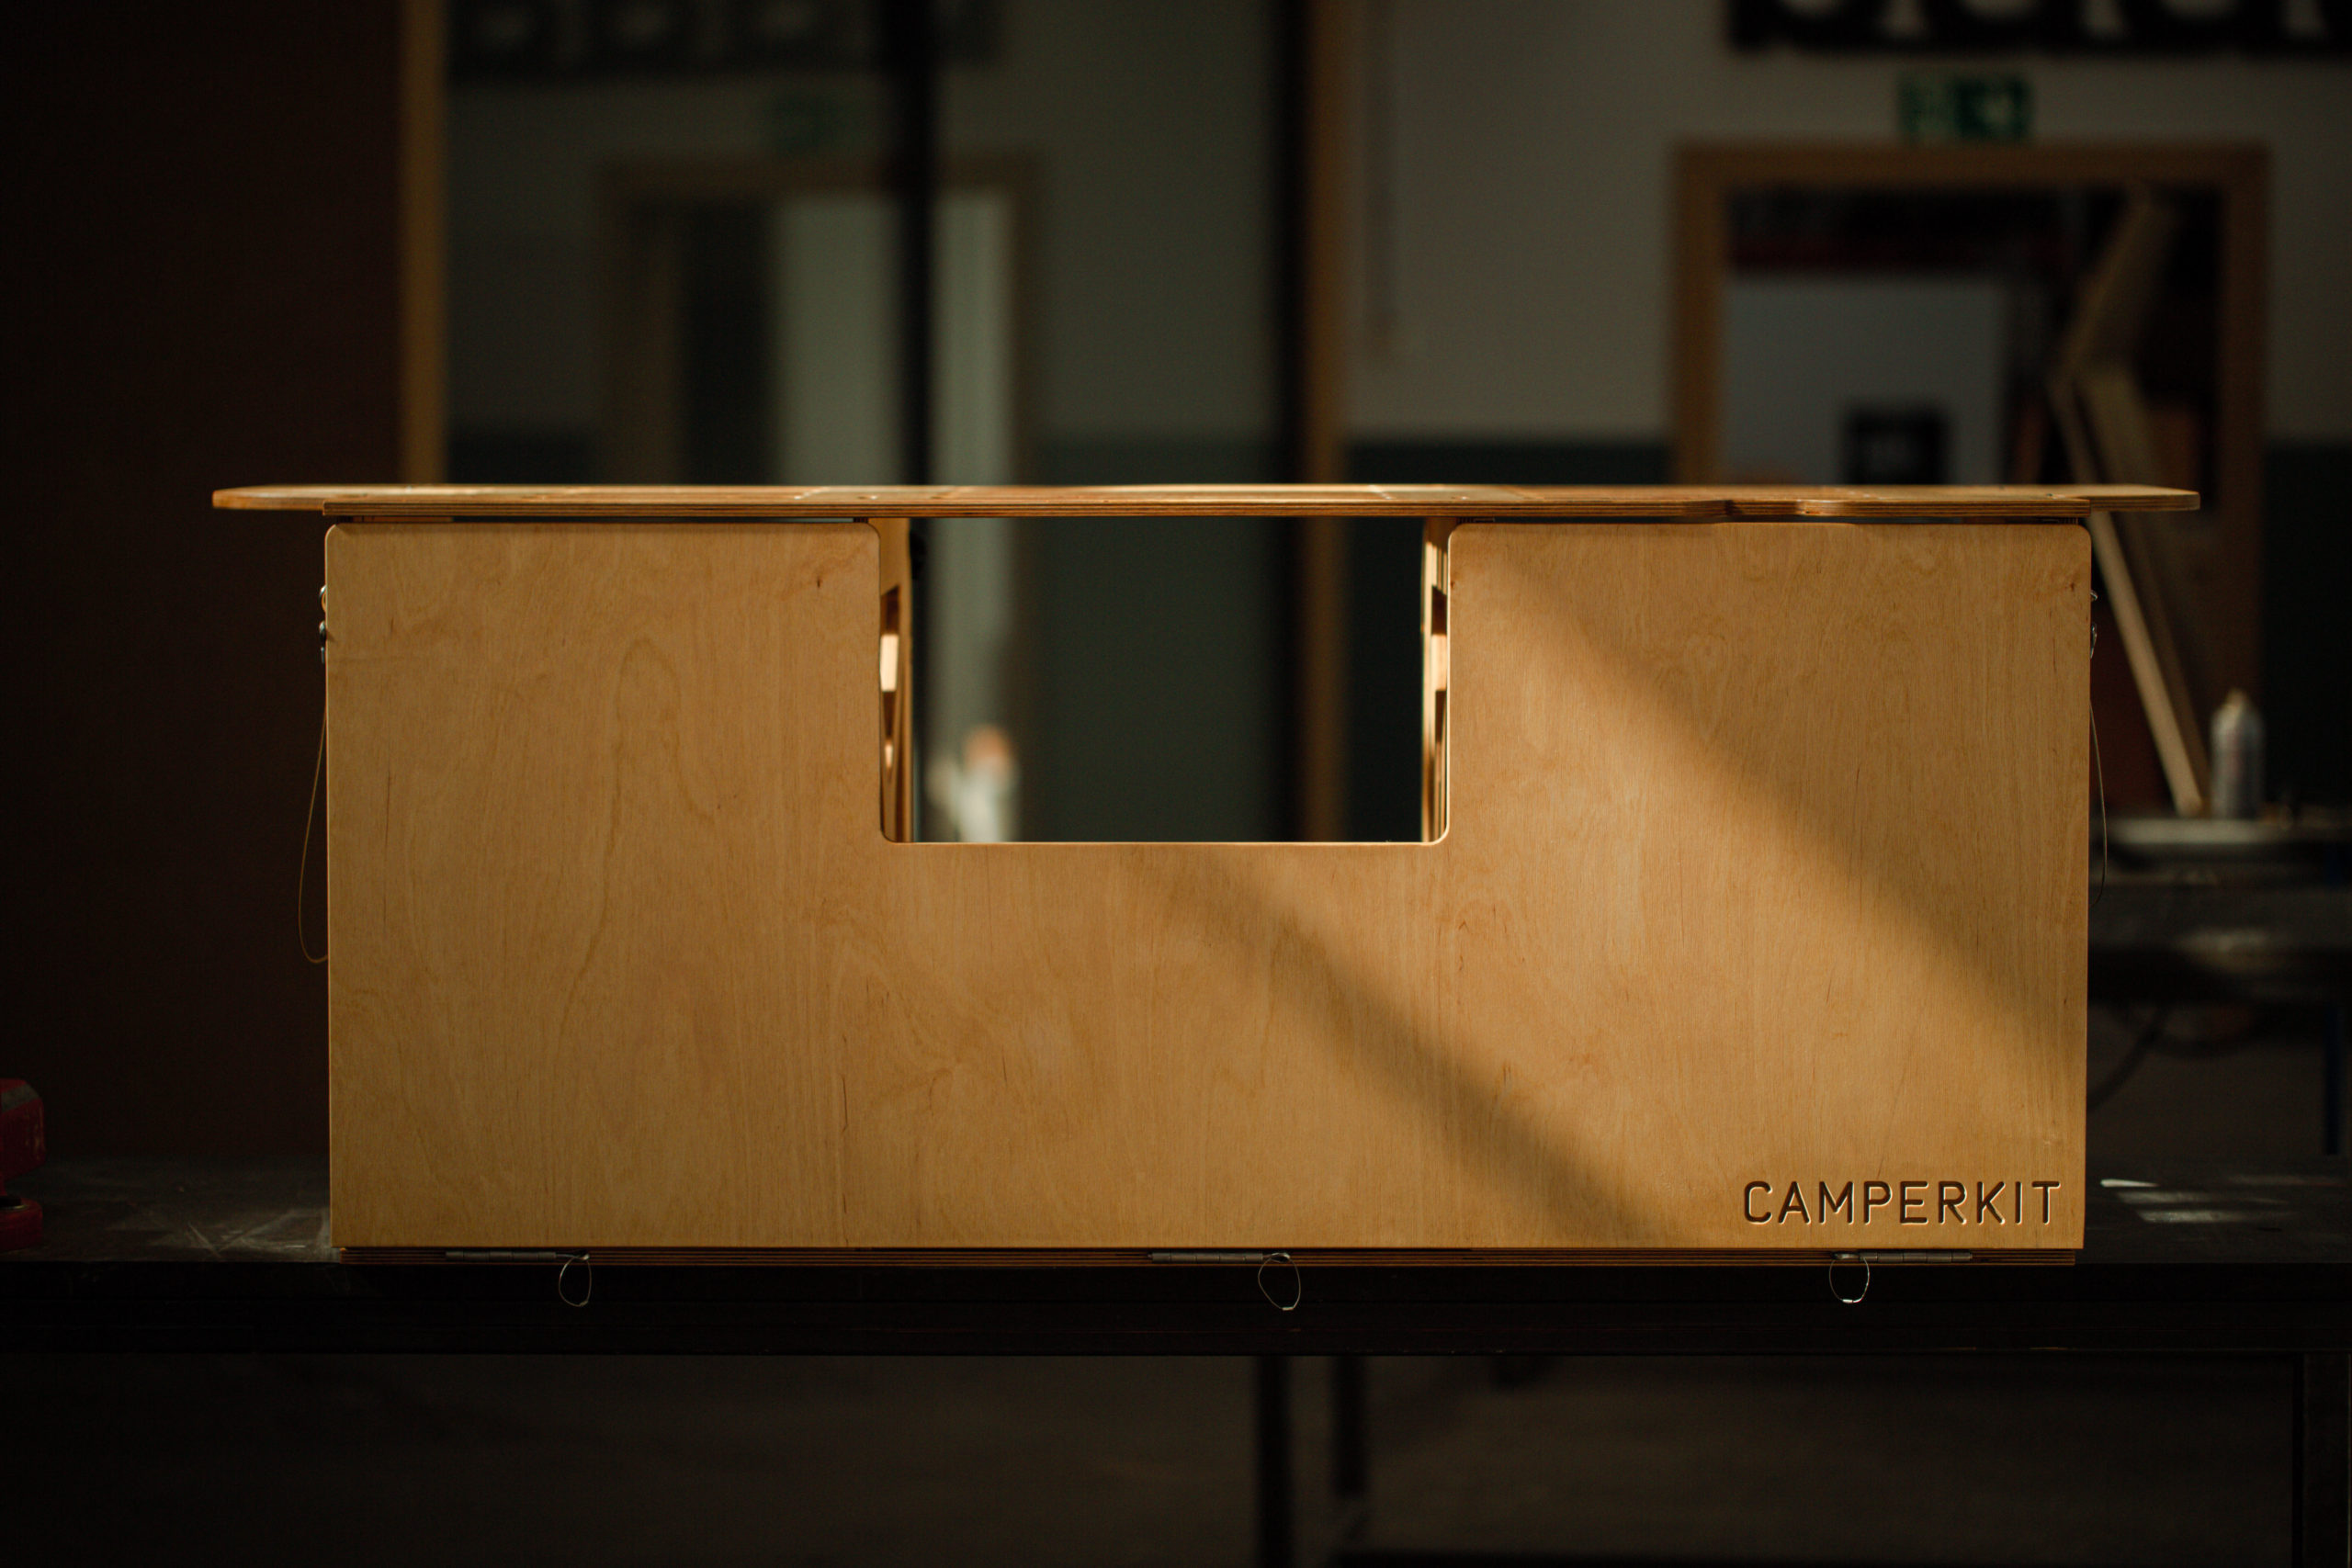 Camperkit - Flexible Campermodule